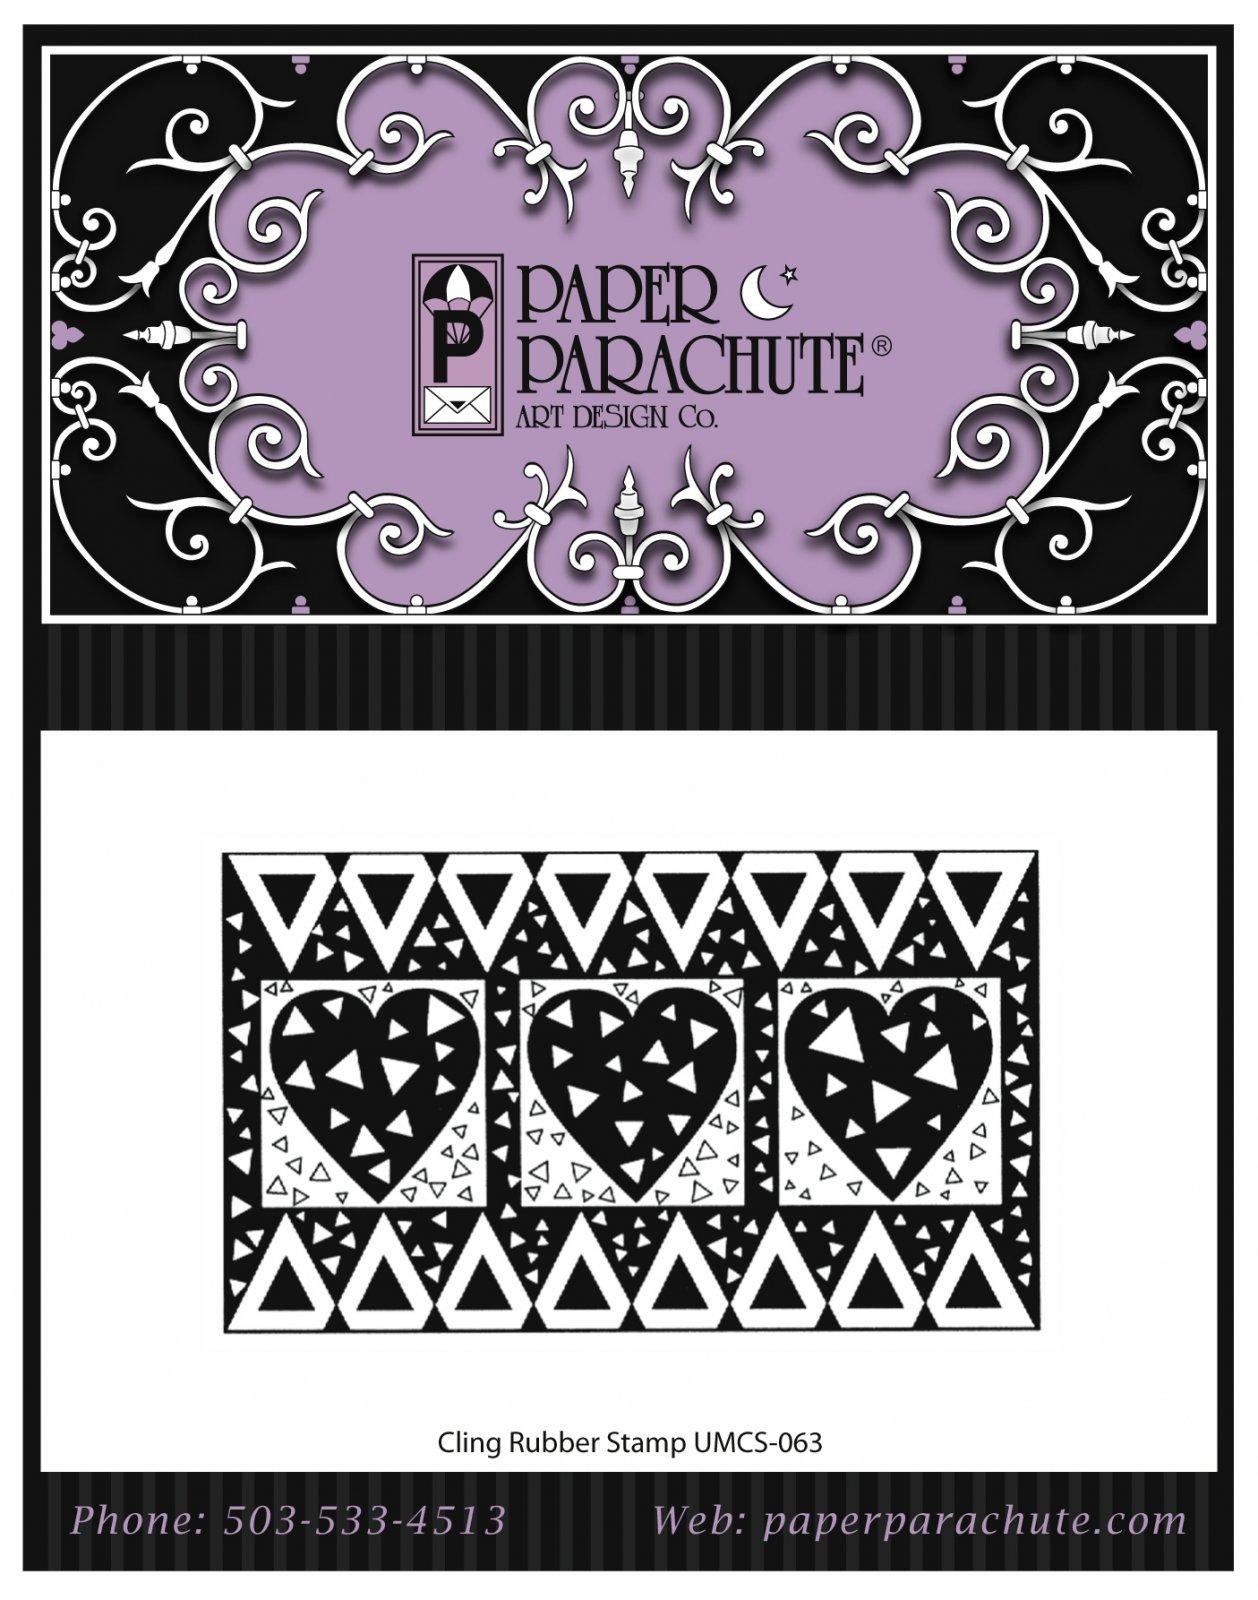 Paper Parachute Rubber Stamp - UMCS63